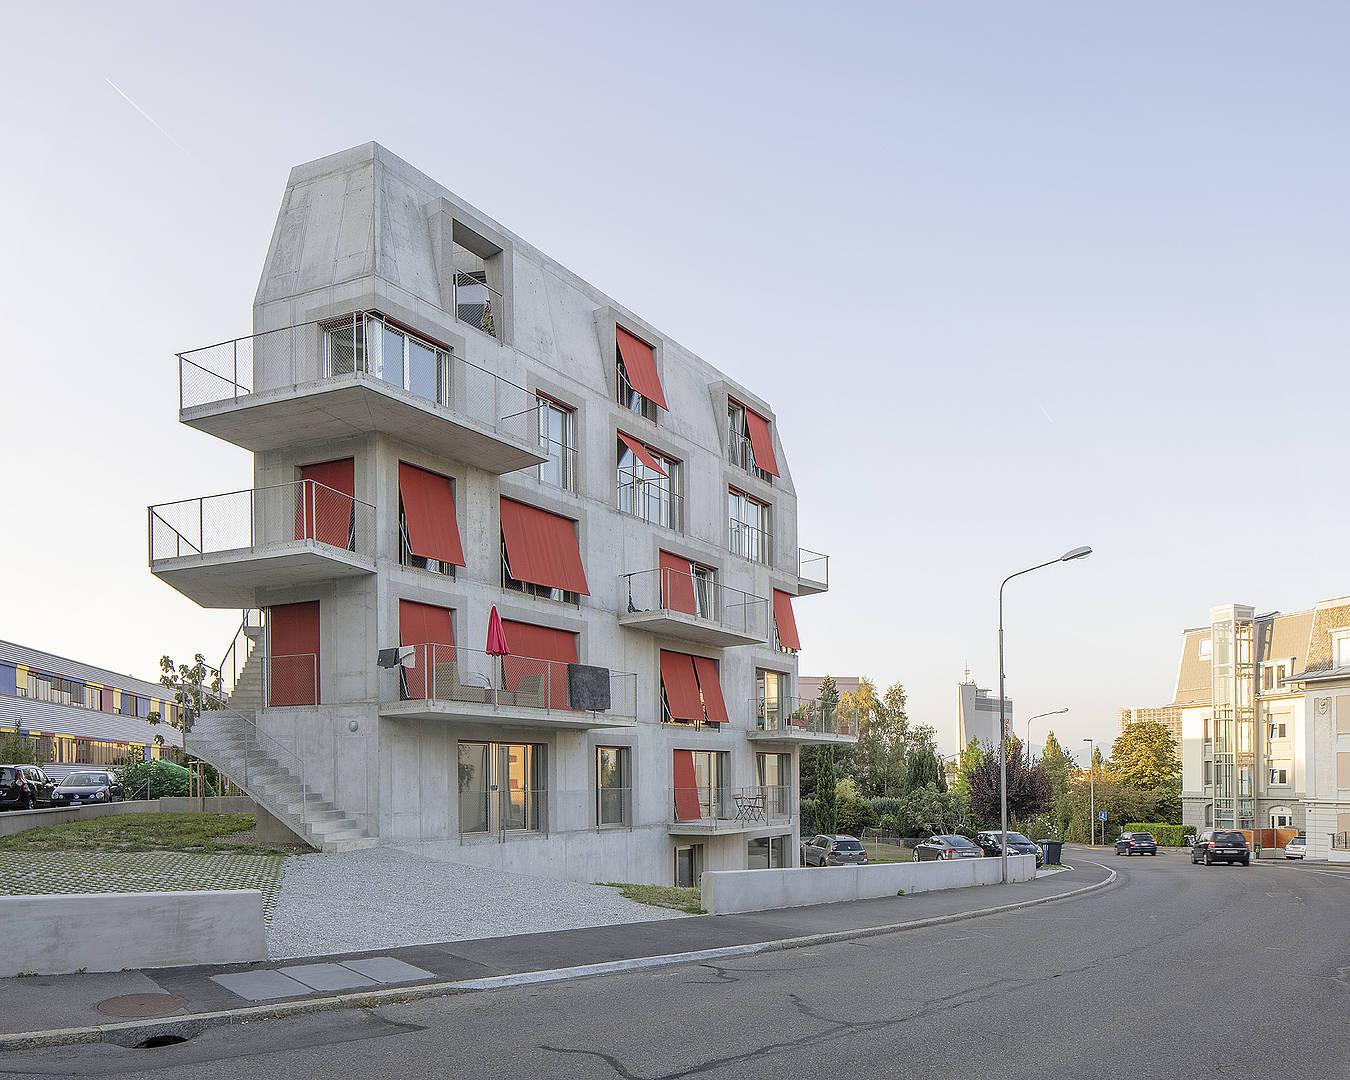 Dreier frenzel architecture communication immeuble